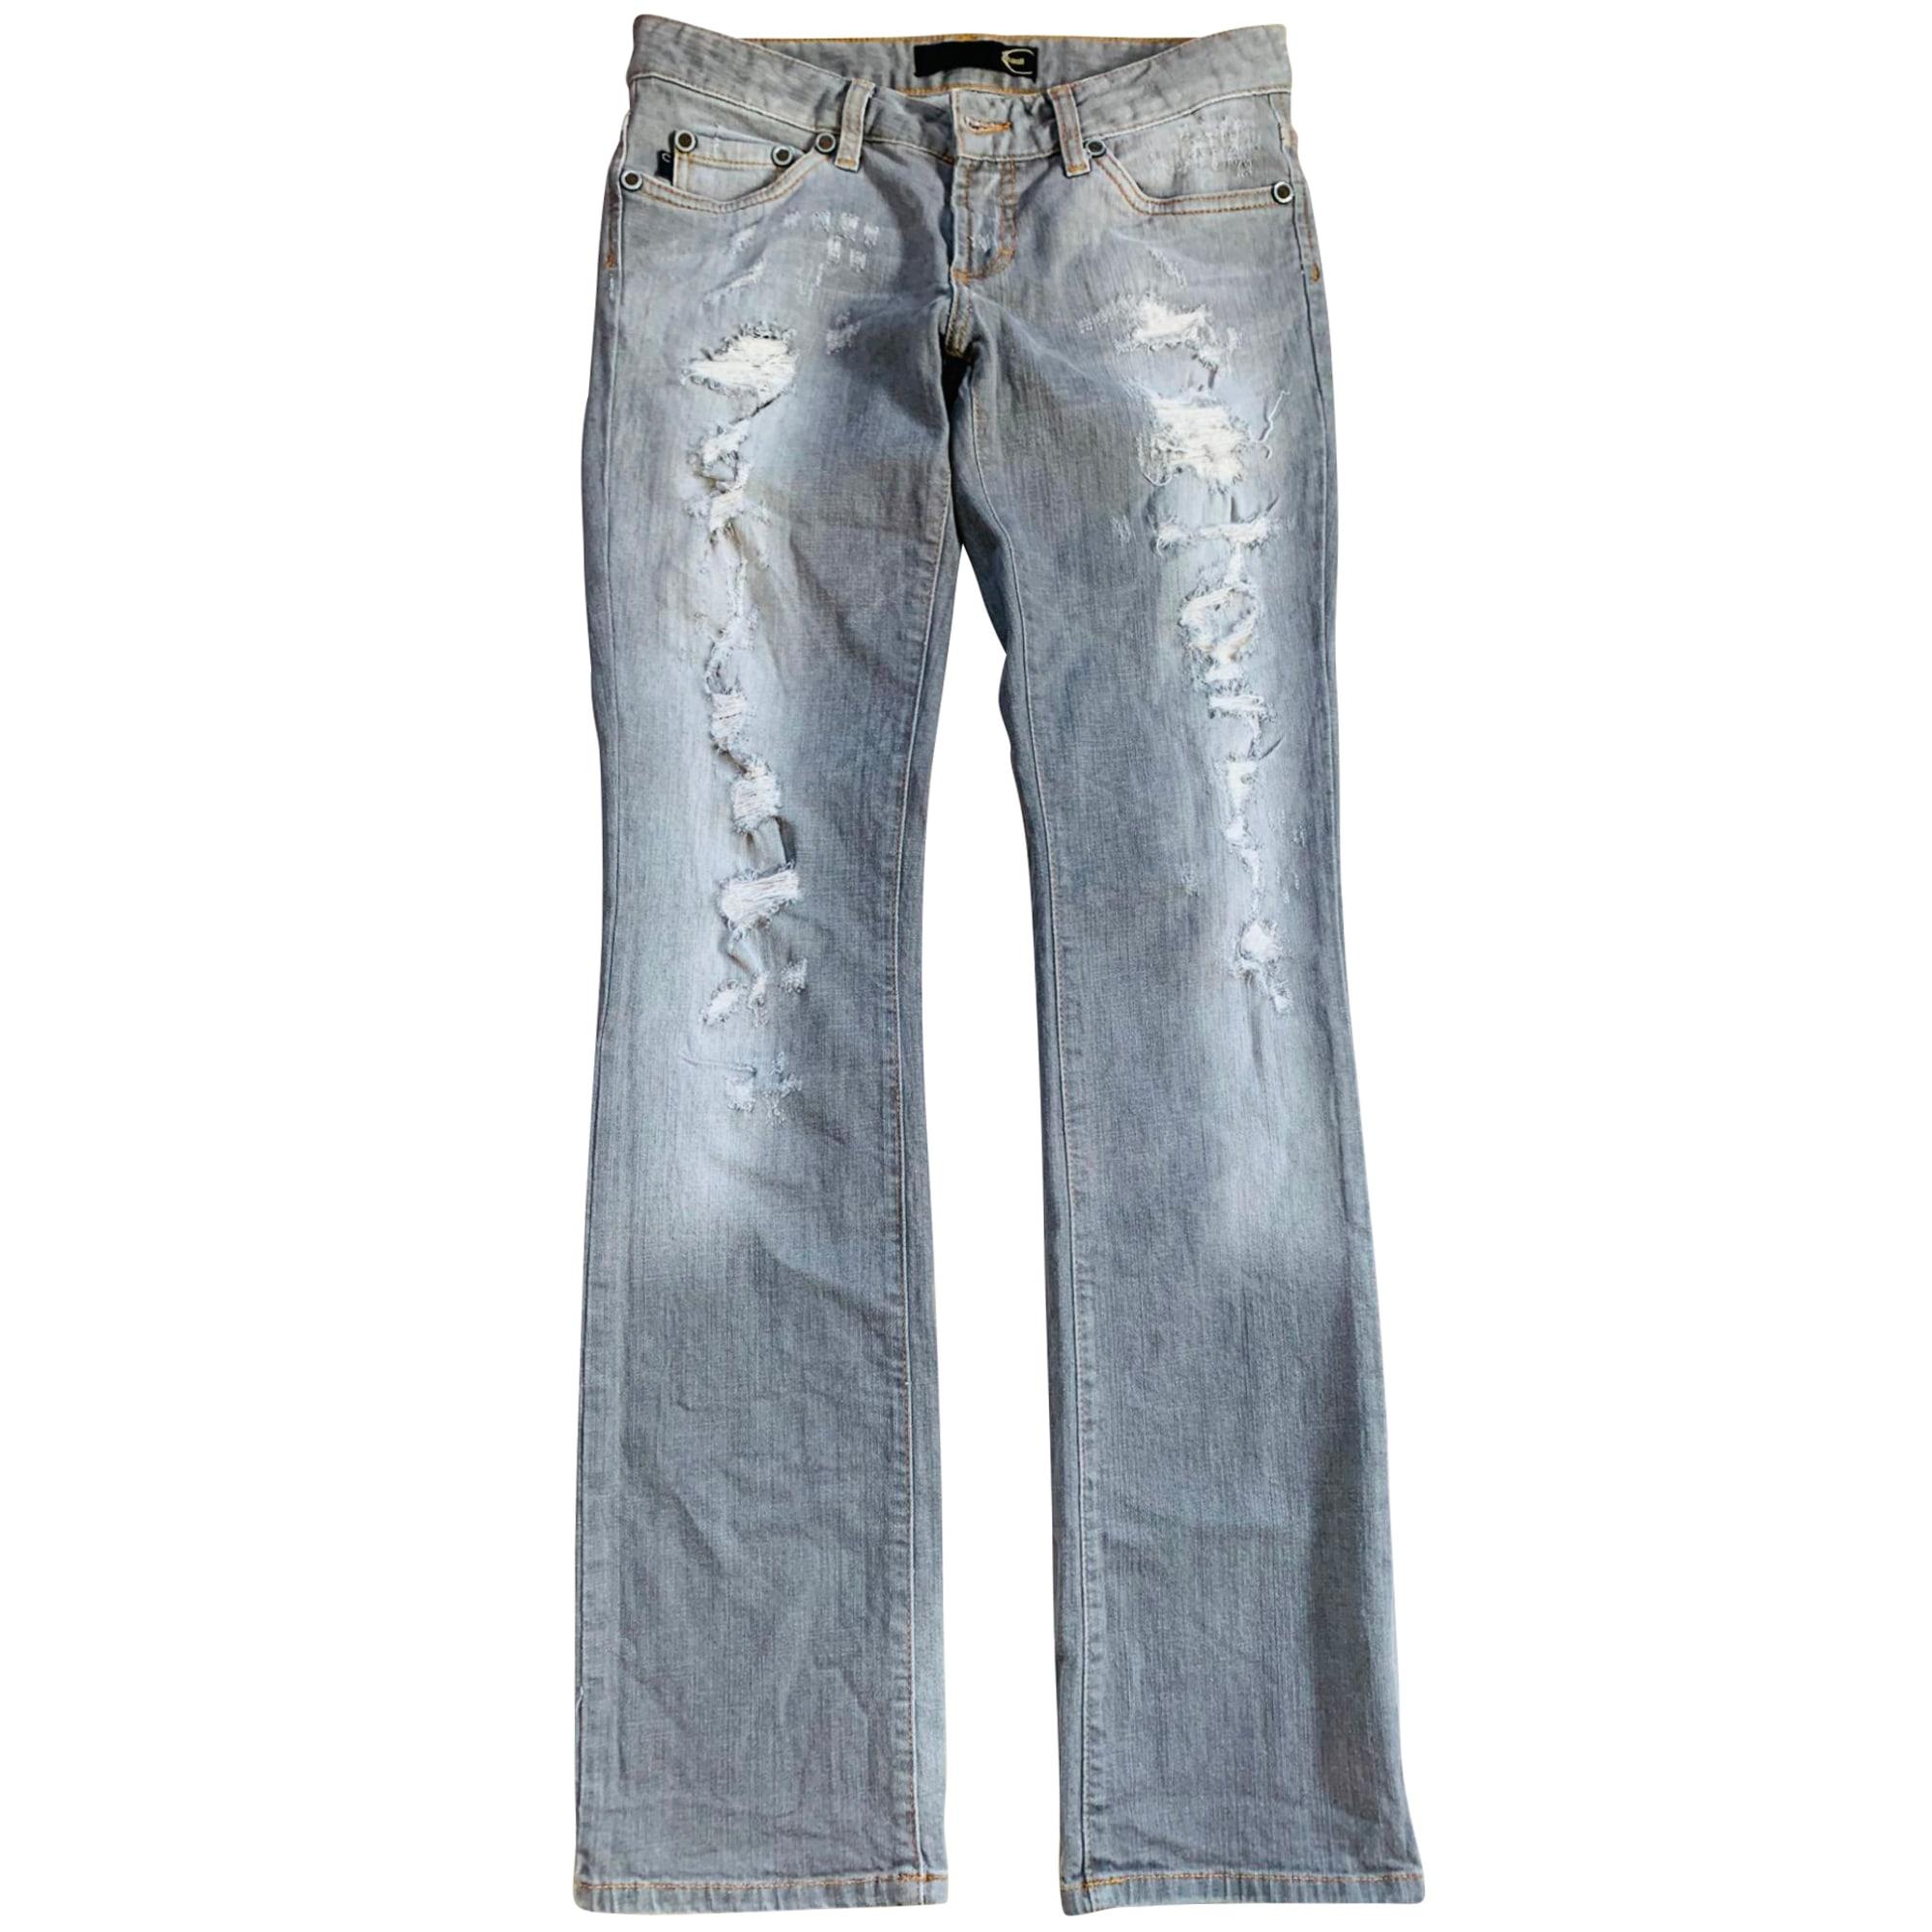 Jeans droit JUST CAVALLI Gris, anthracite